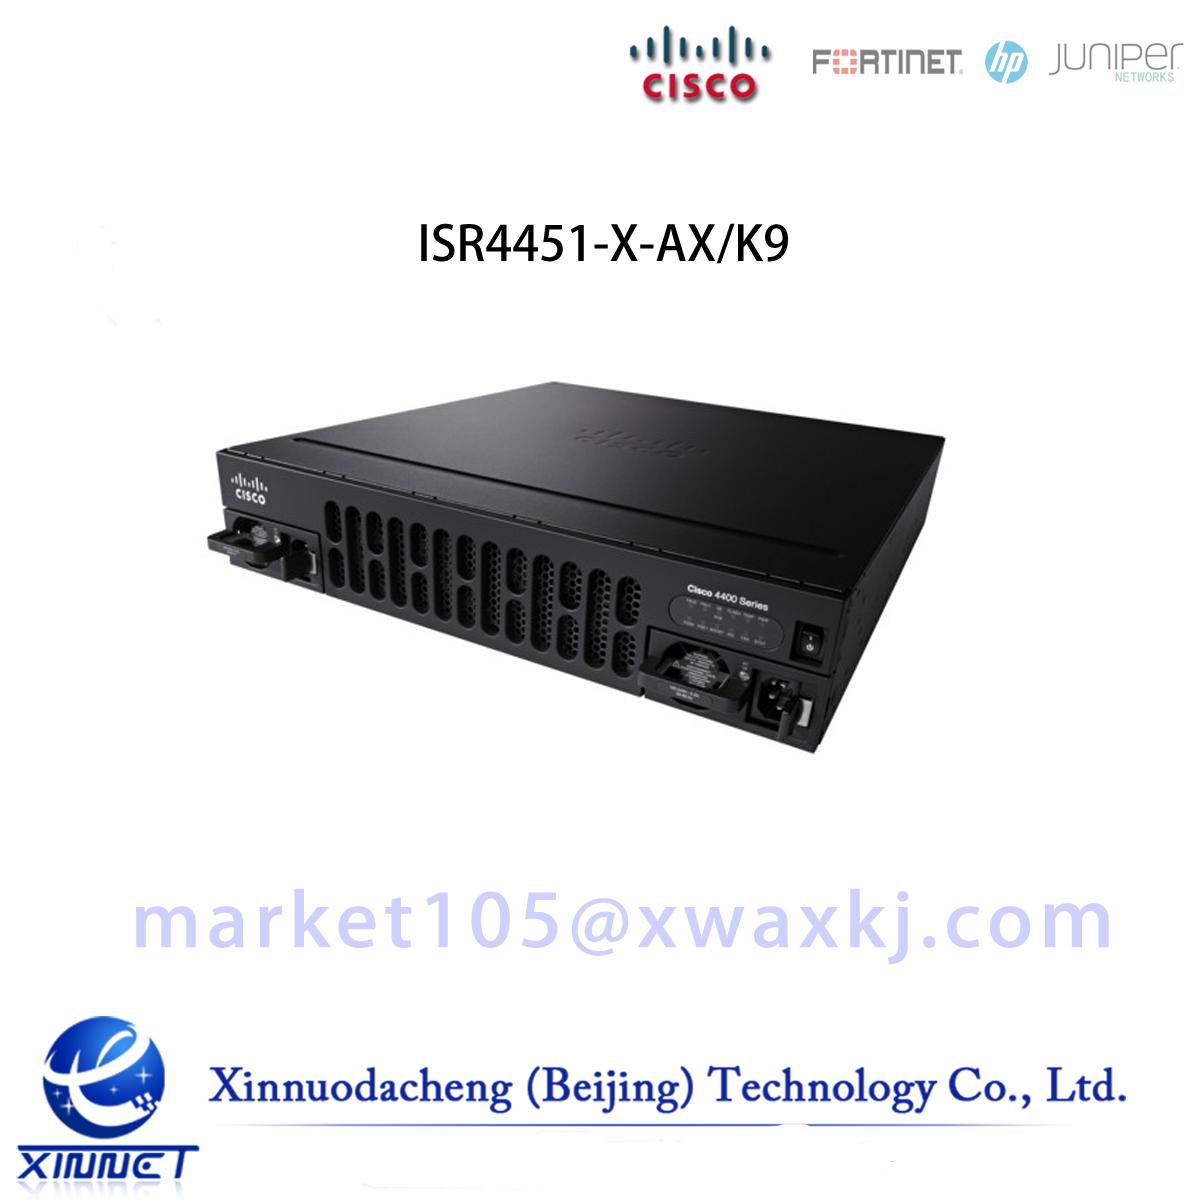 ISR4451-X-AX/K9 Cisco ISR 4451 AX Bundle with APP and SEC license